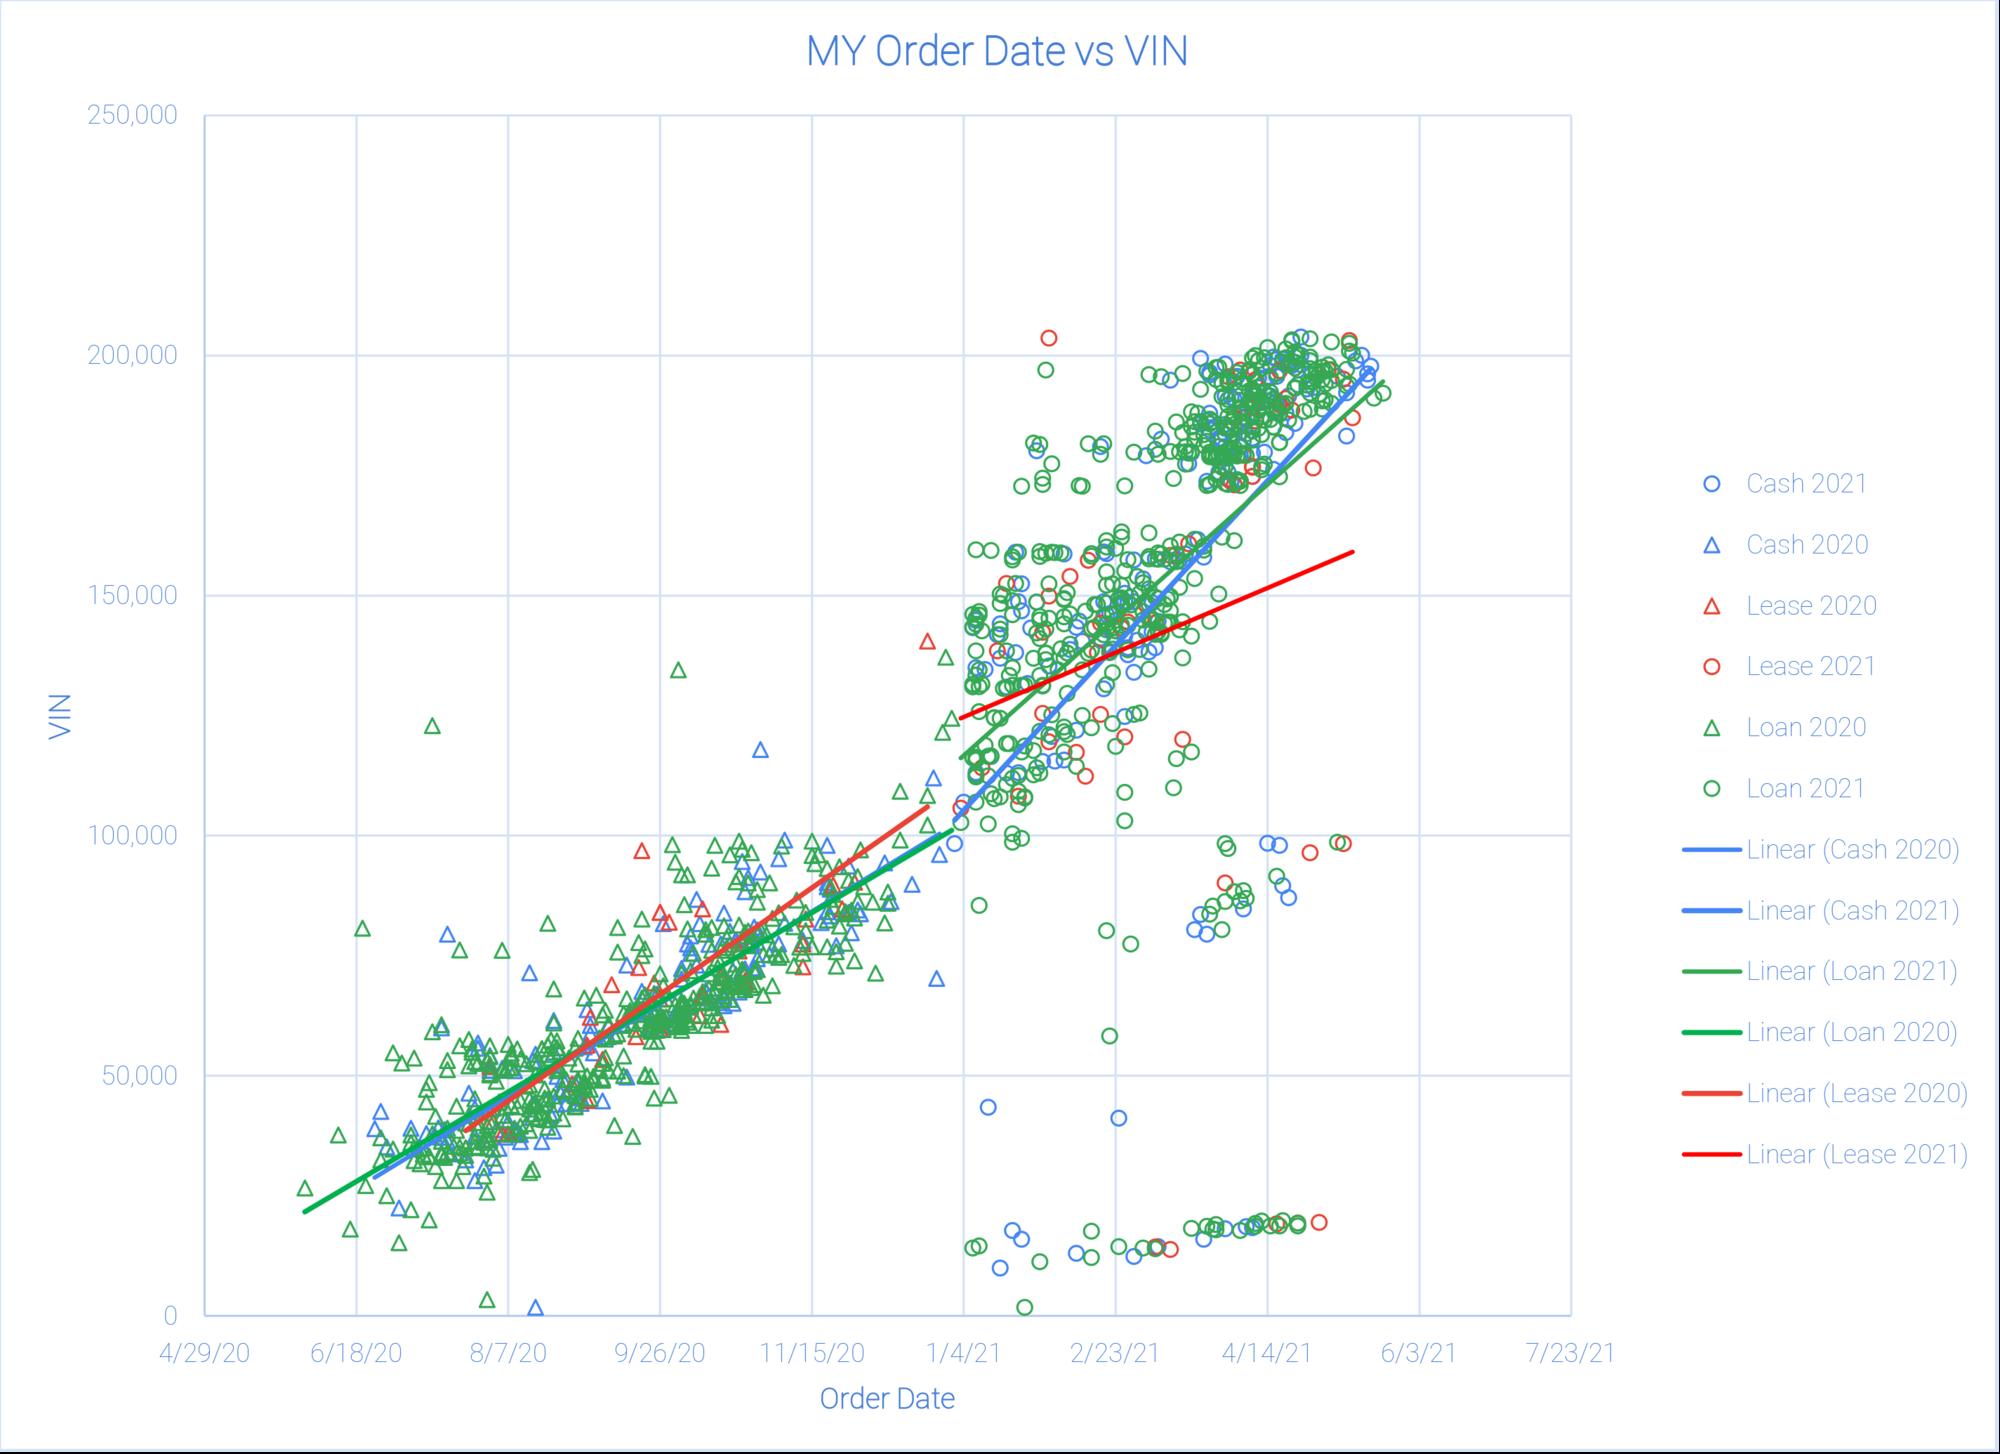 Tesla MY Order Date vs VINs.png